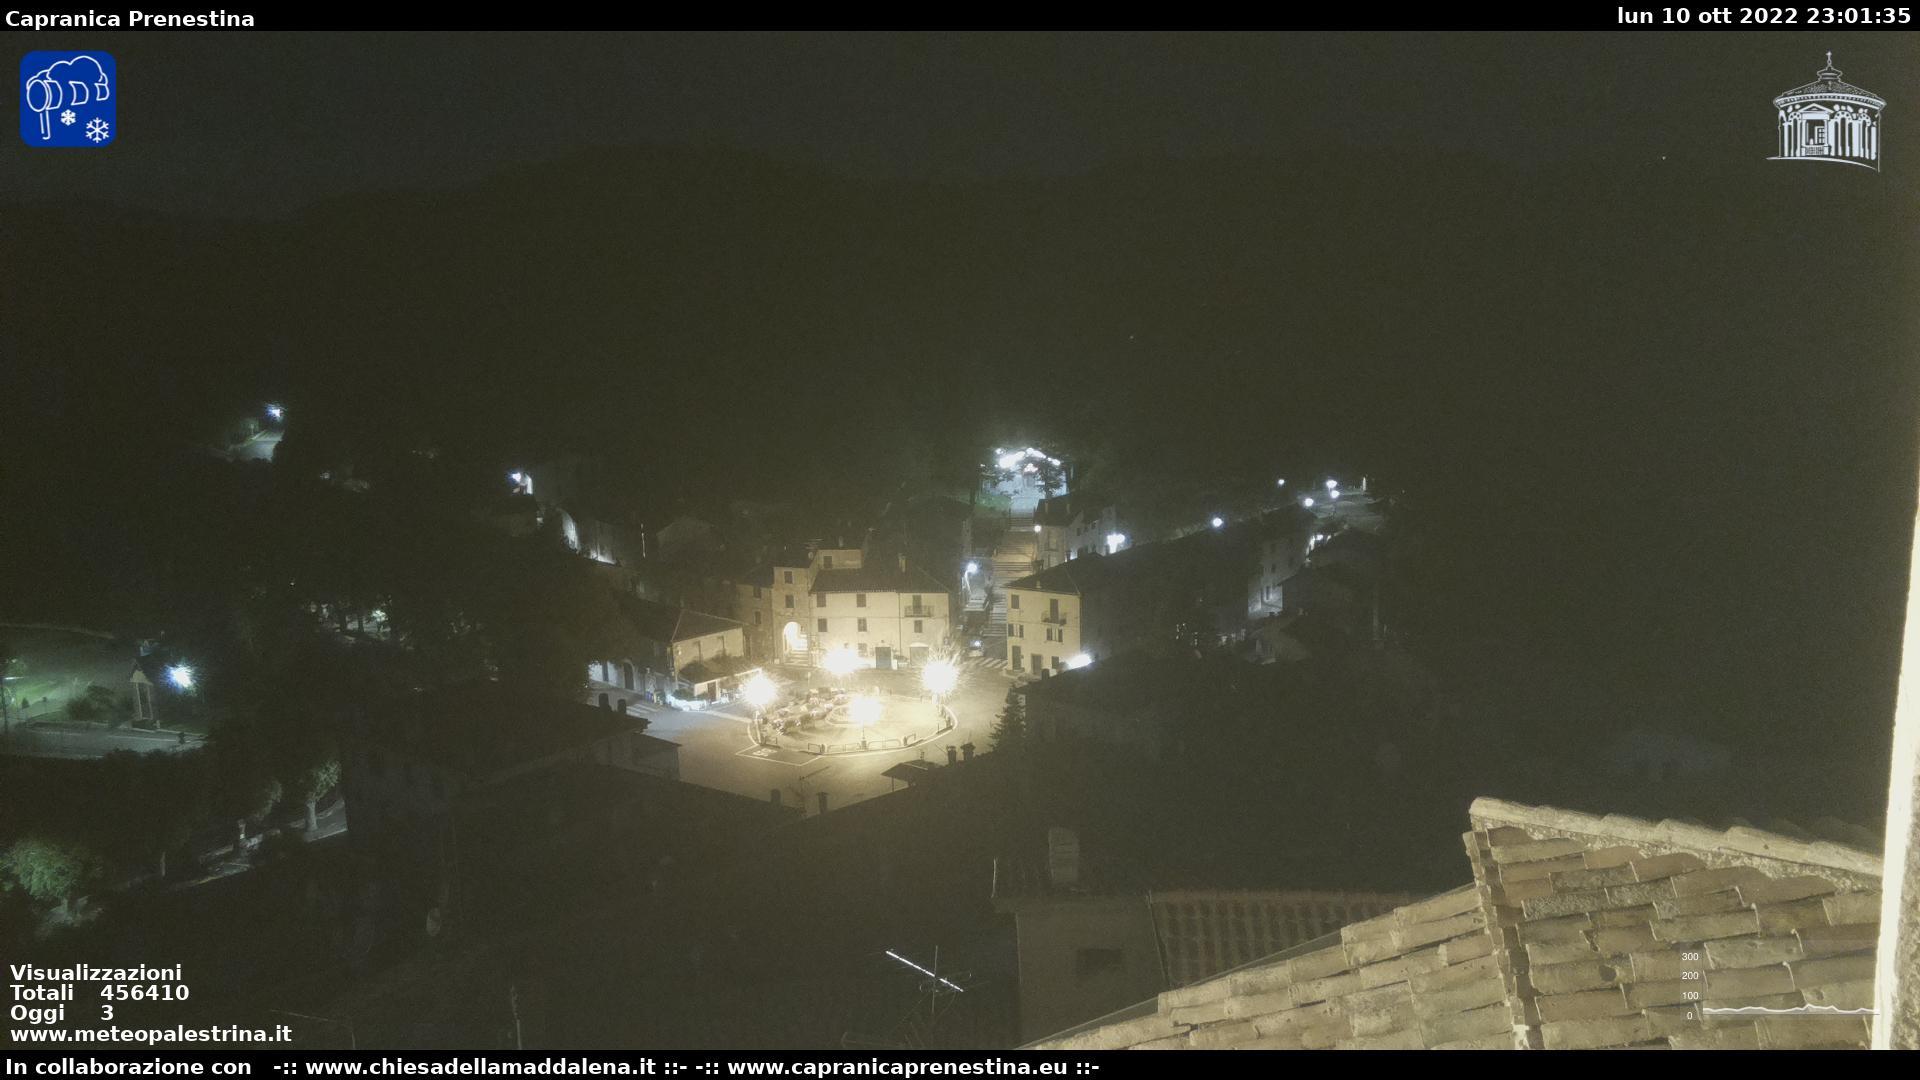 Capranica - Monti Prenestina